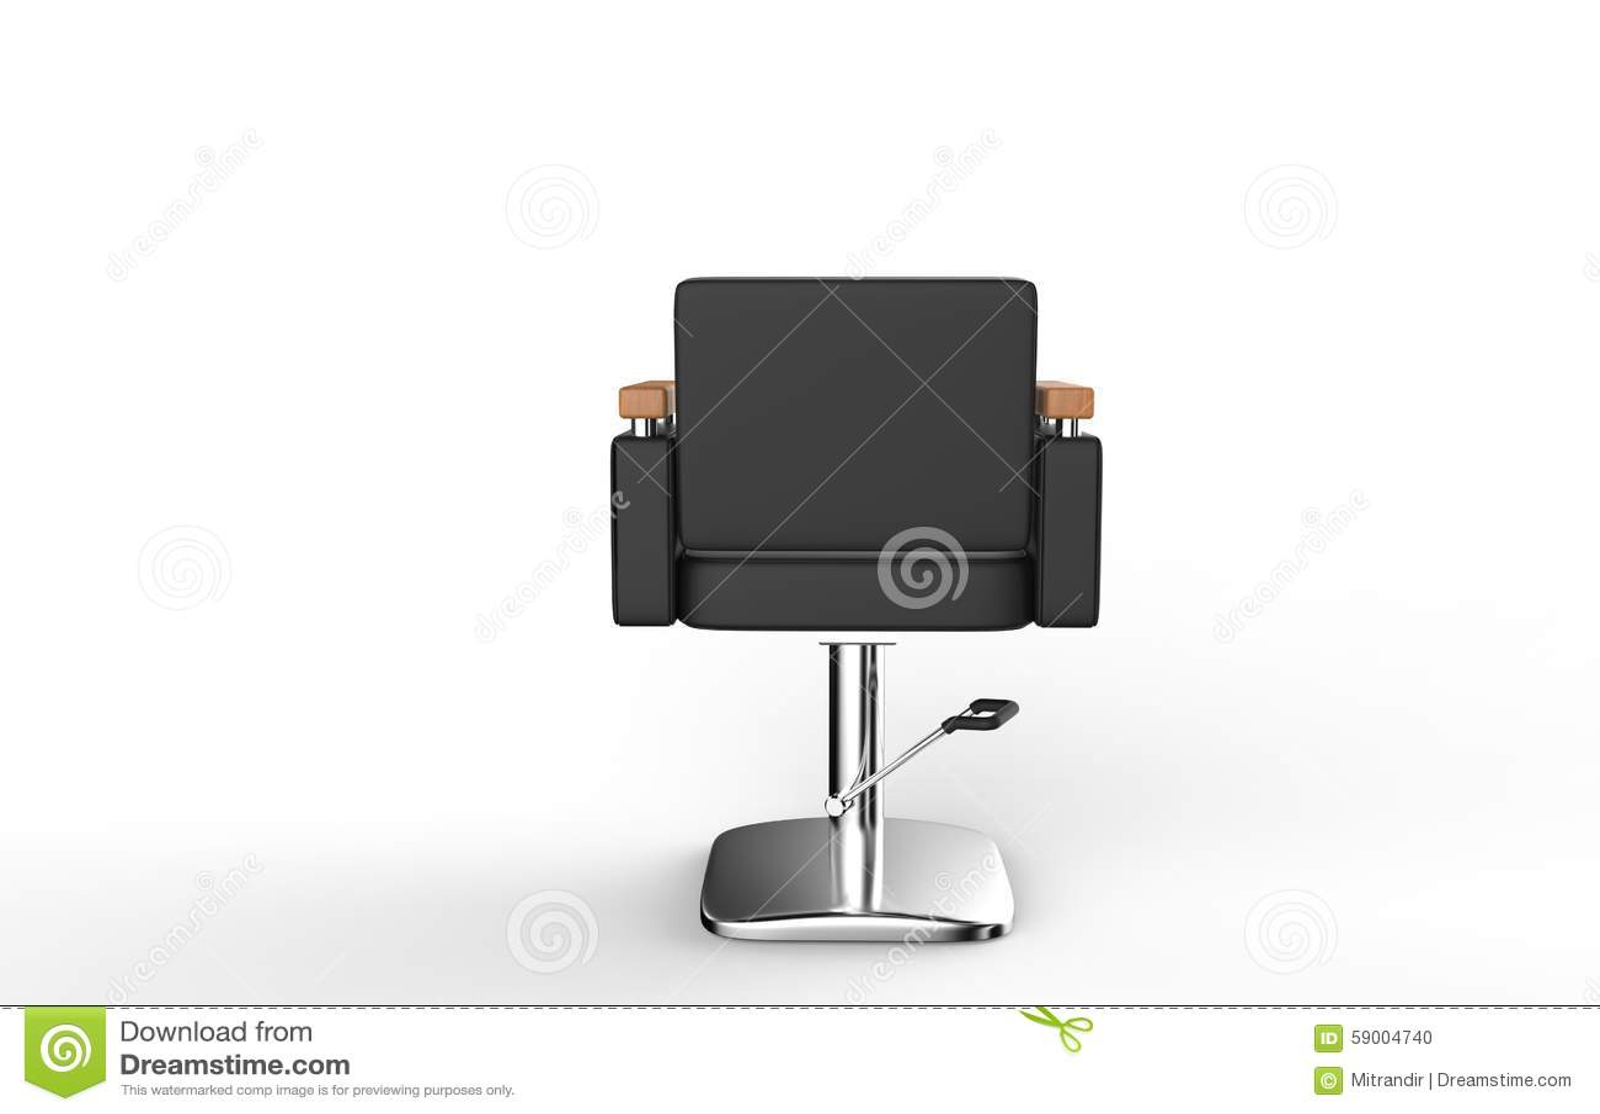 Vue De Dos Chaise Salon Coiffure